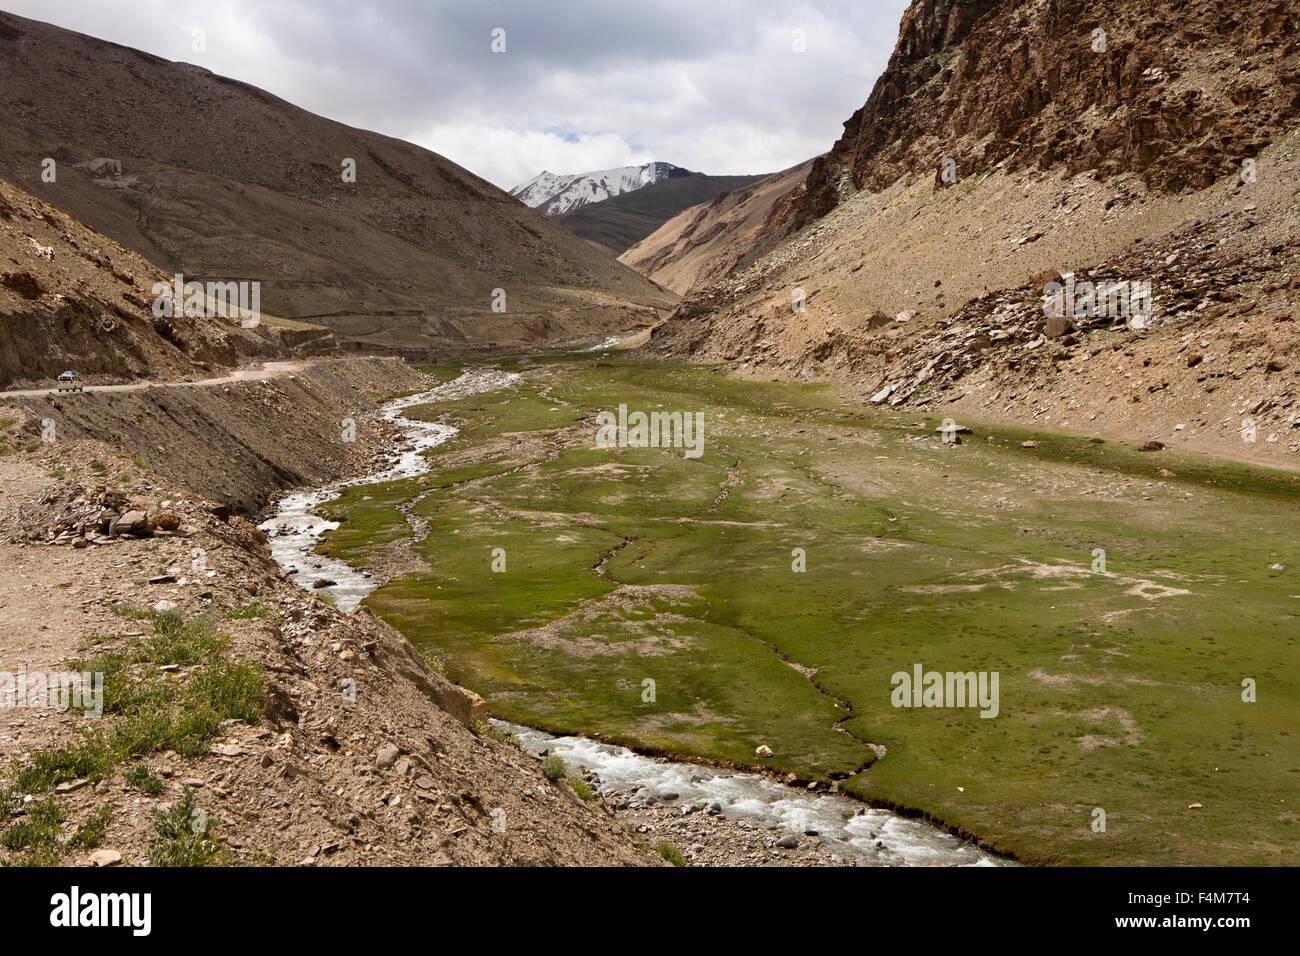 India, Jammu & Kashmir, Ladakh, Rumtse, high altitude road to Taglang La pass above meltwater stream - Stock Image